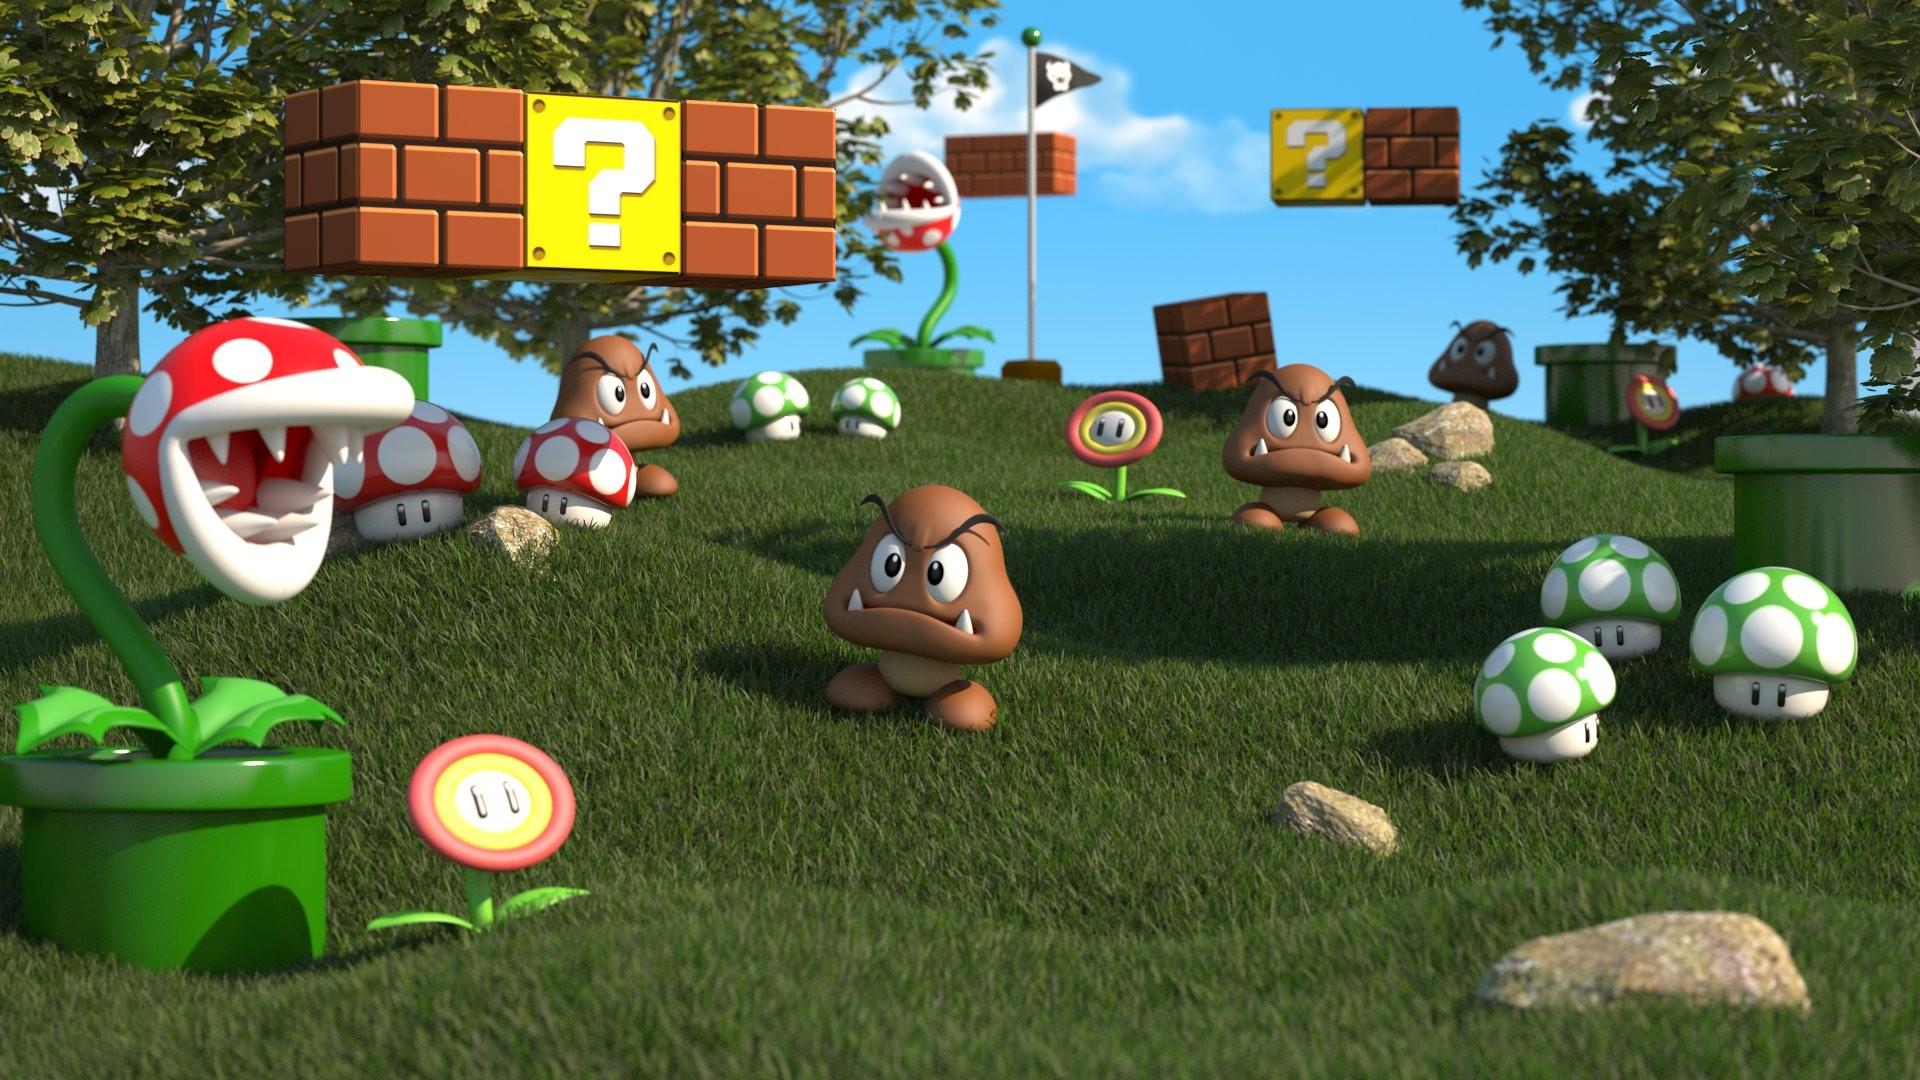 Video Game – Super Mario 3D Land Wallpaper